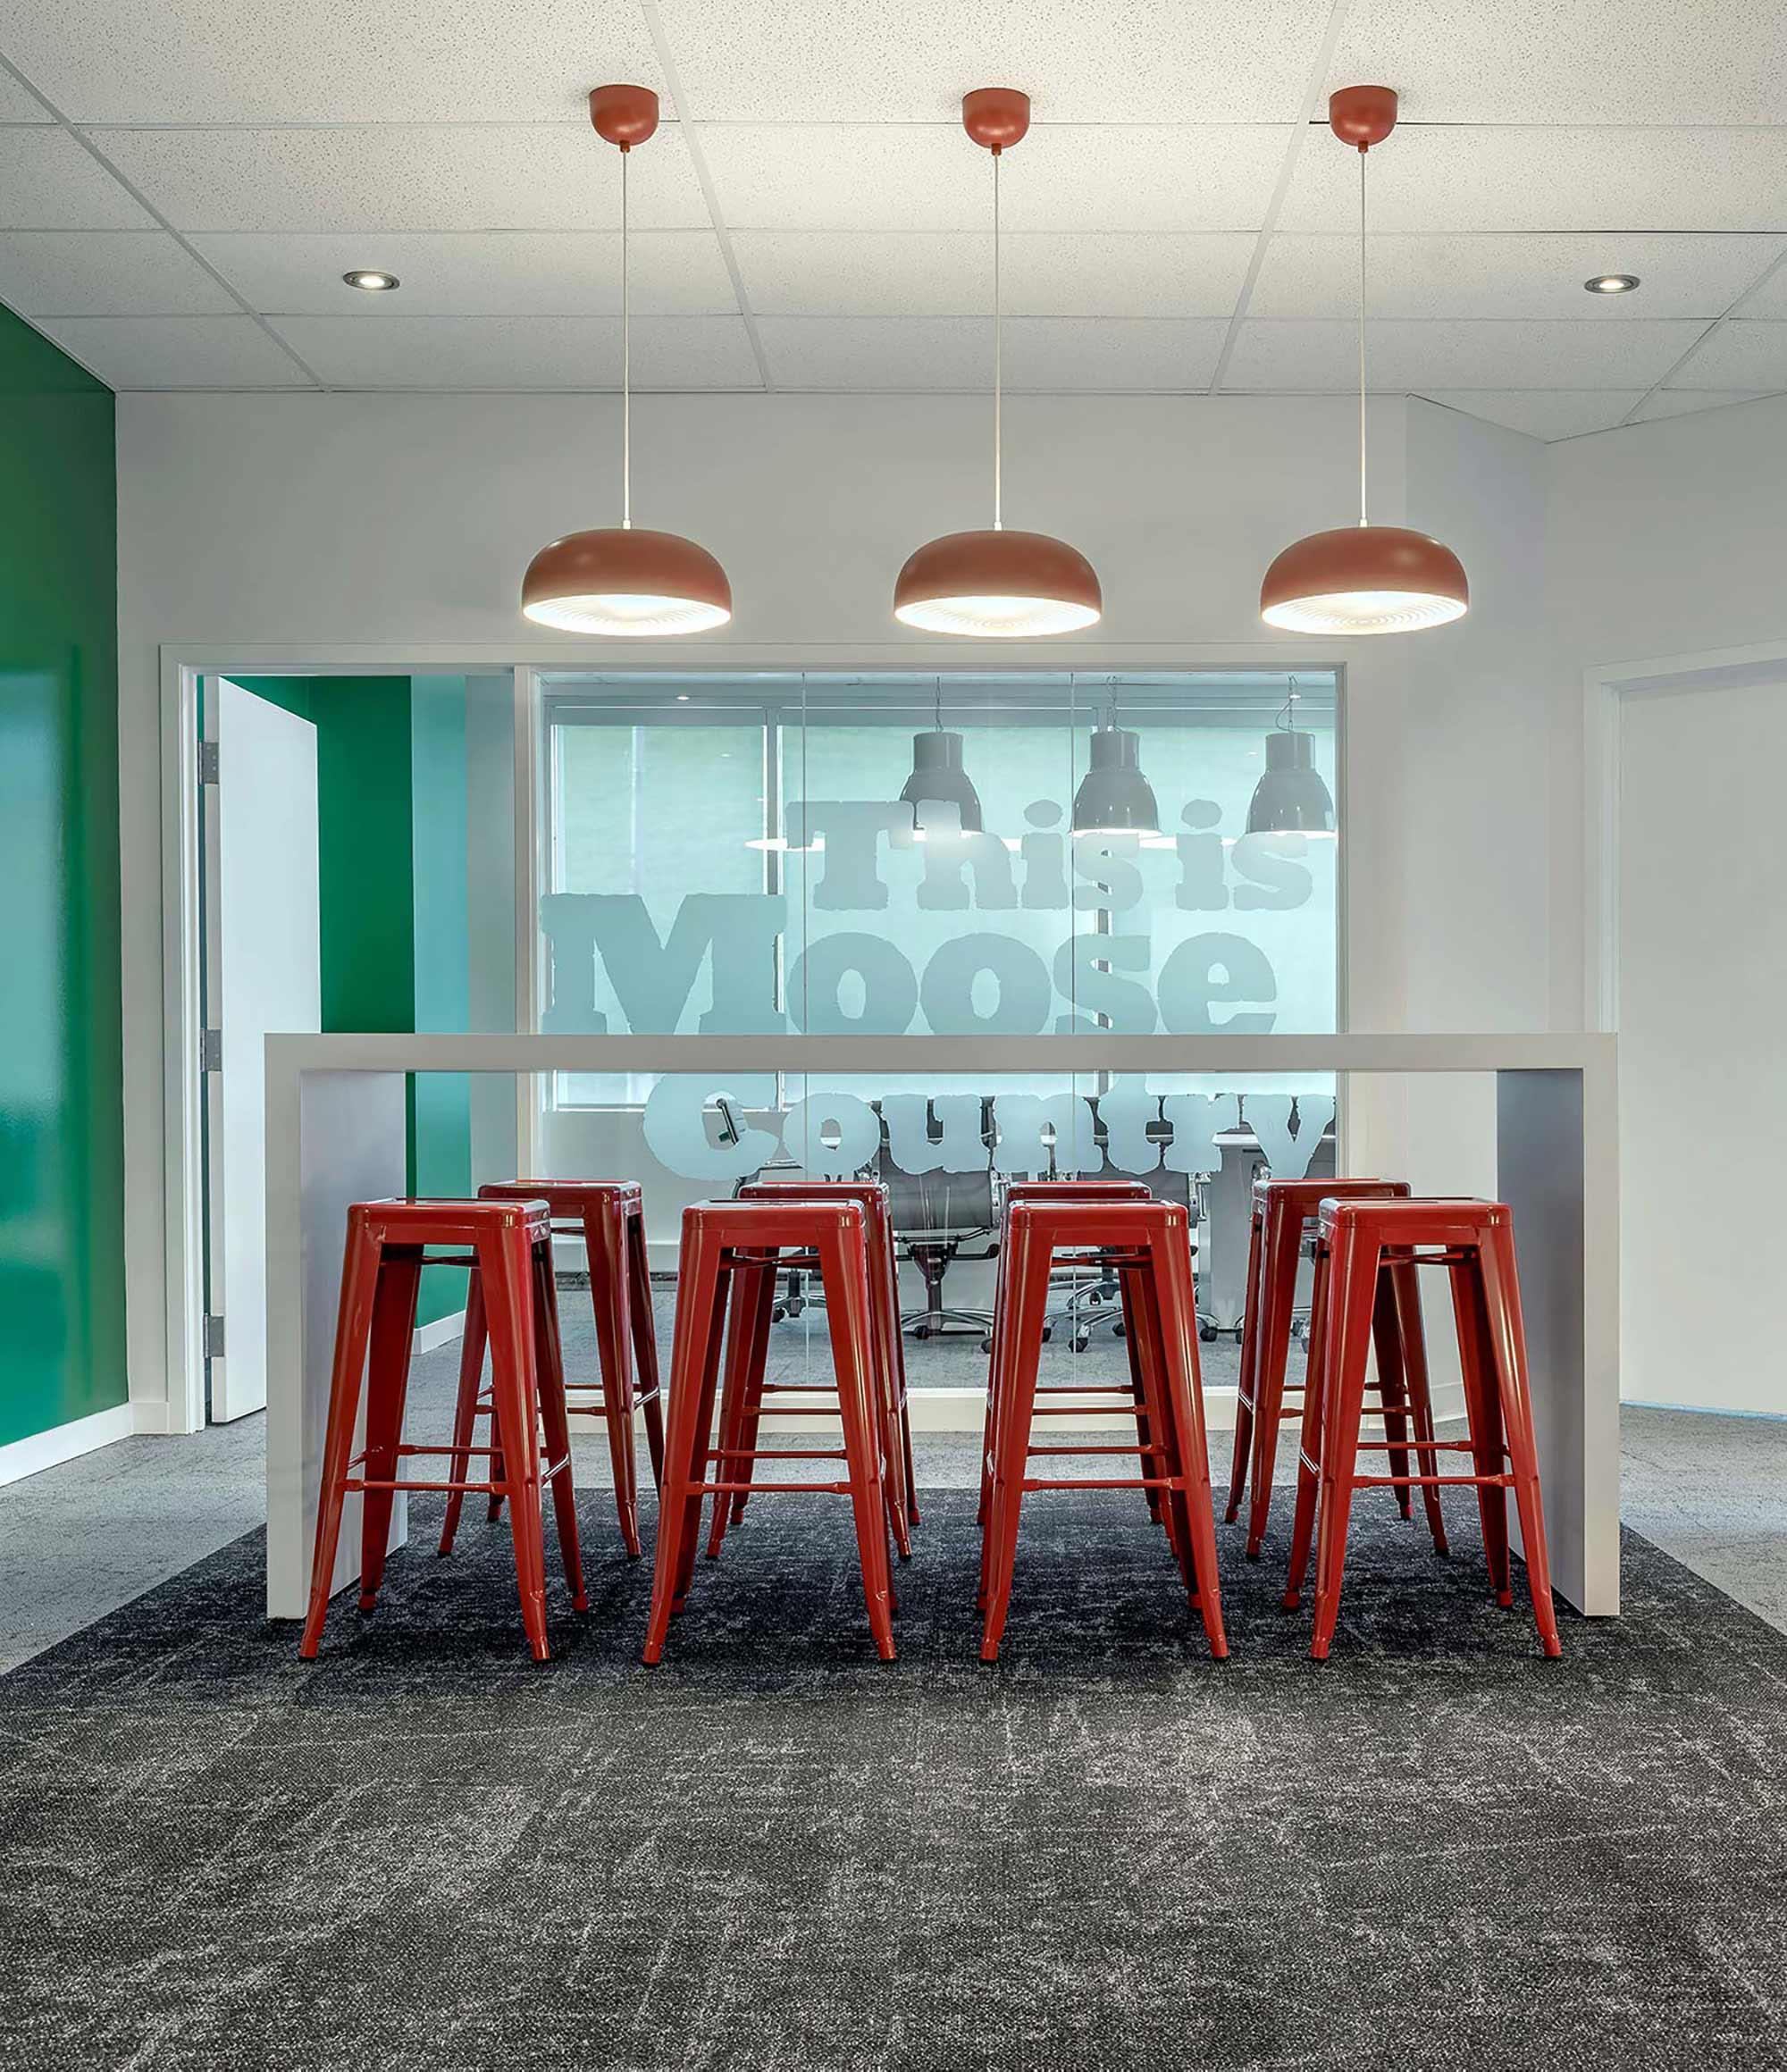 interior-design-athletic-hokcey-office-common-area.jpg